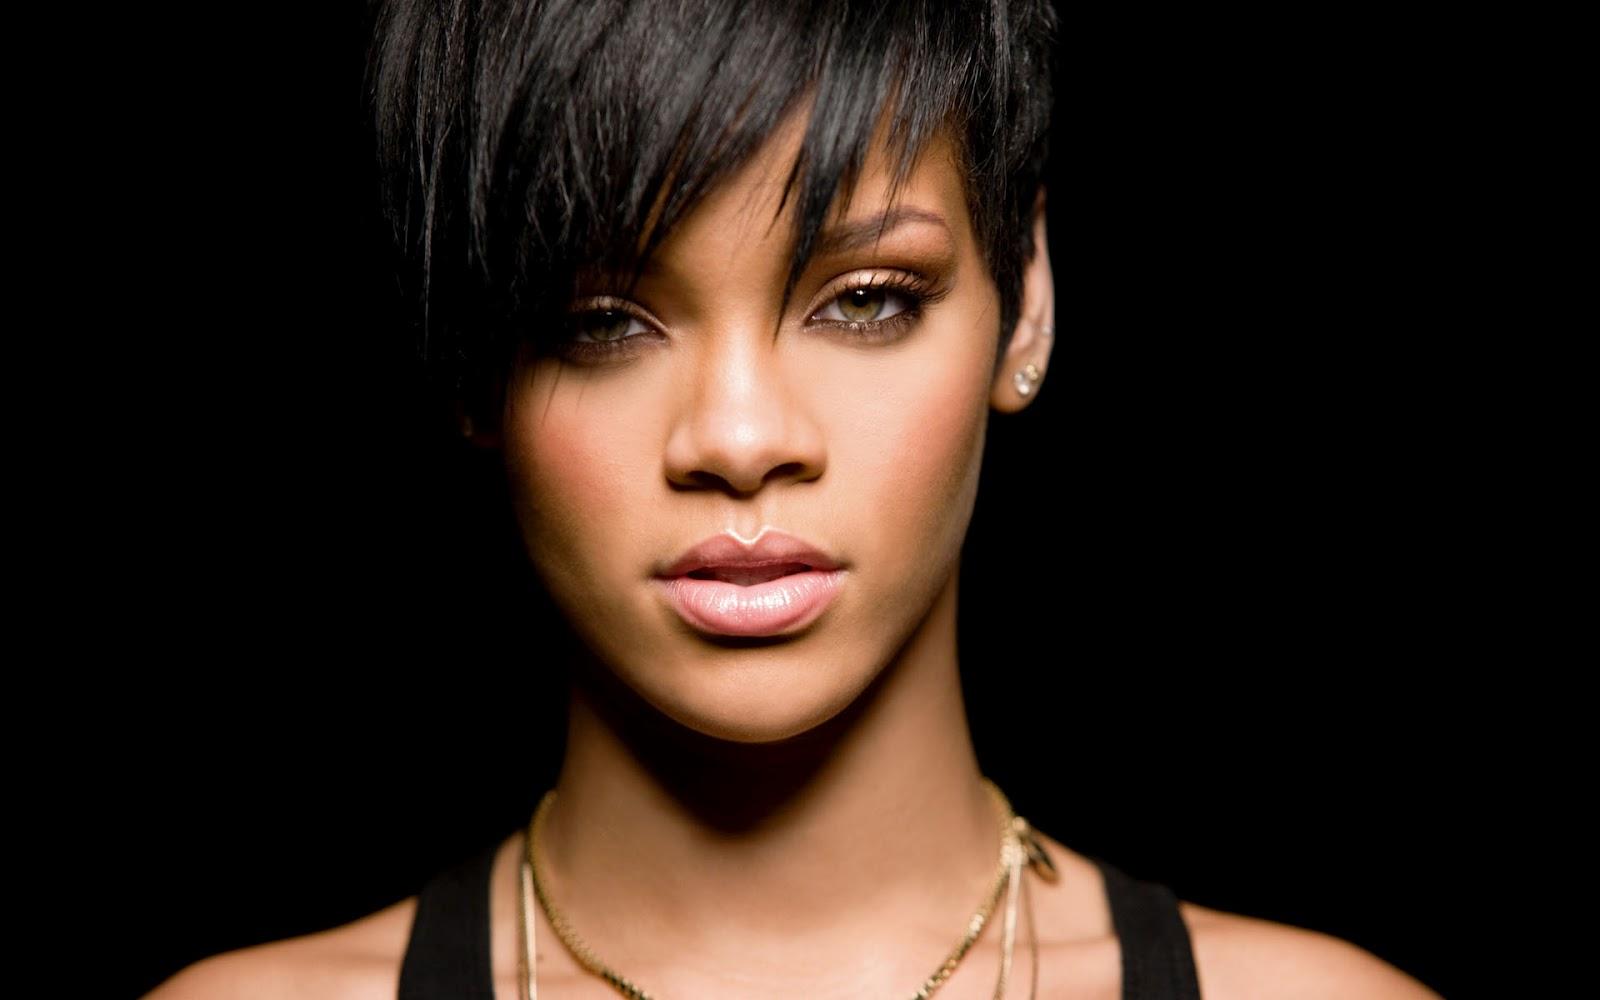 http://1.bp.blogspot.com/-r10g2T3Ye0k/T9SFkQjeEzI/AAAAAAAAACI/E8KVP3o3HsU/s1600/Rihanna-Wallpaper-10.jpg